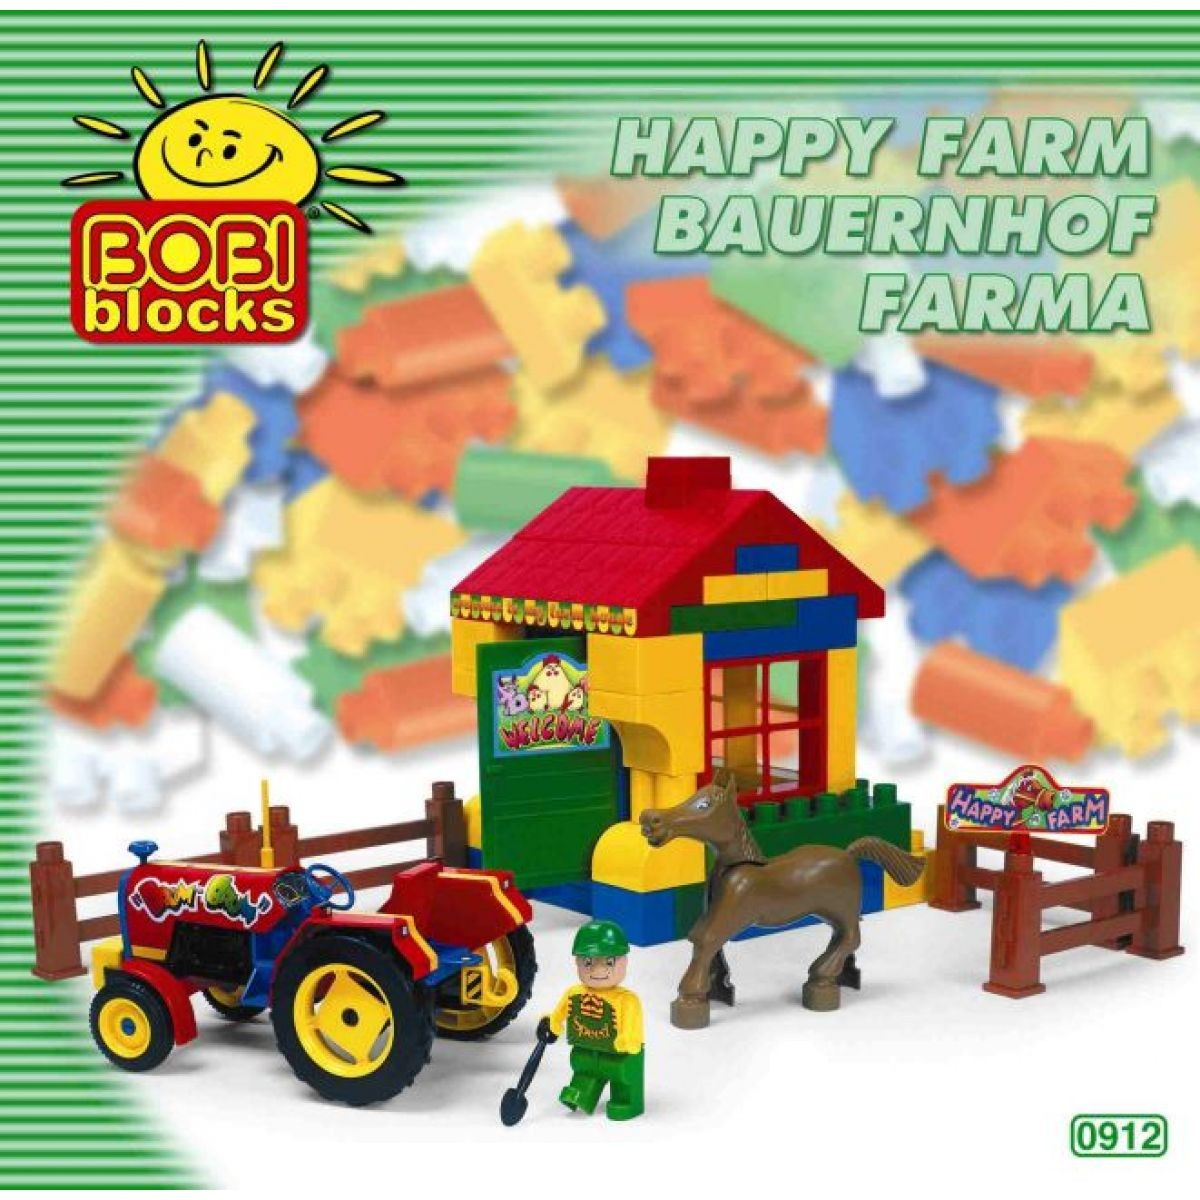 0912 - Bobi - Happy Farm